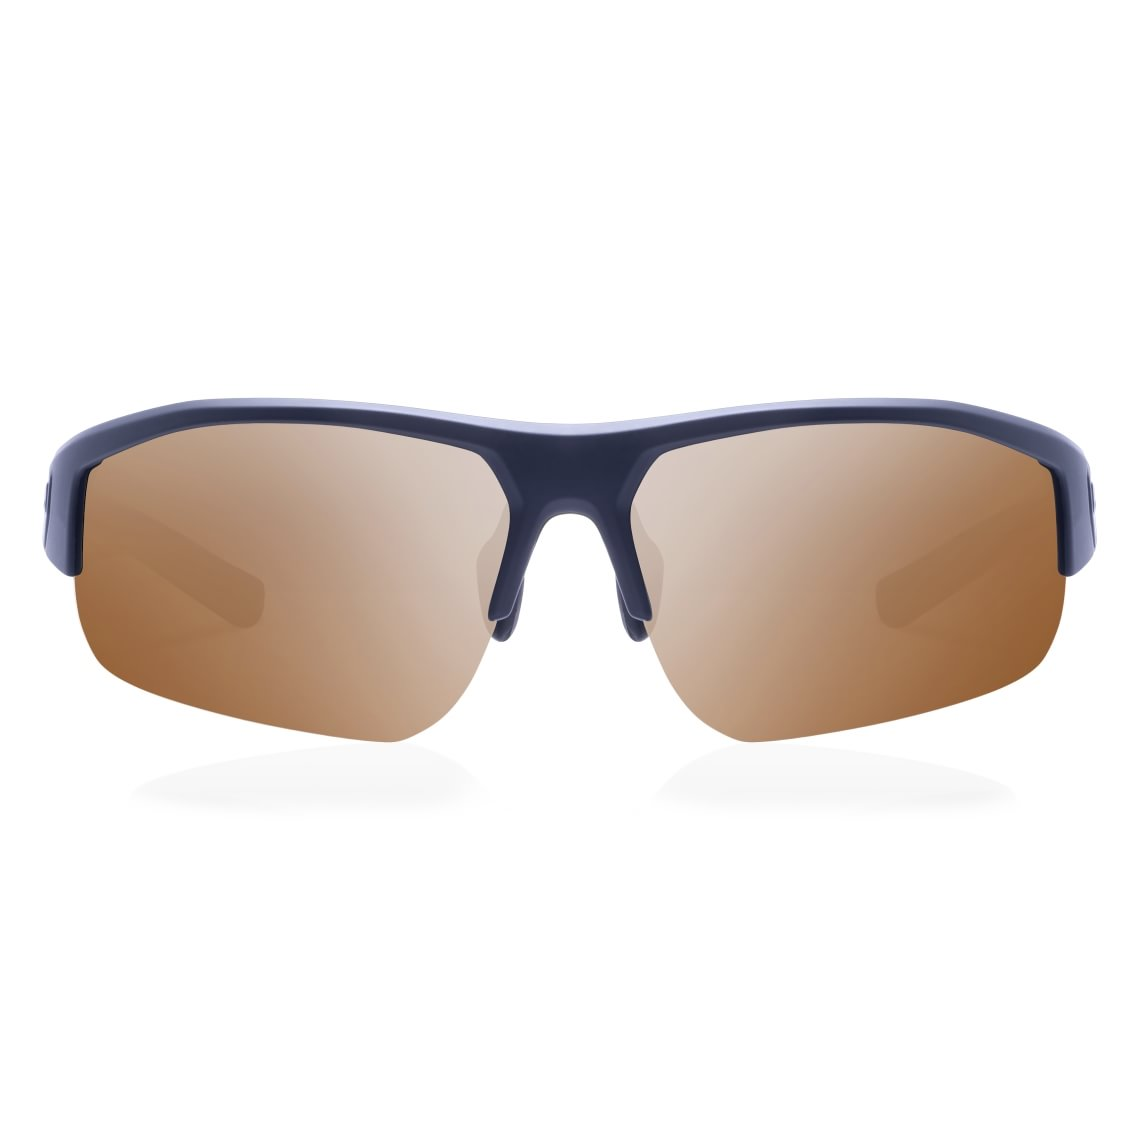 Henrik Stenson Eyewear Stinger Blue